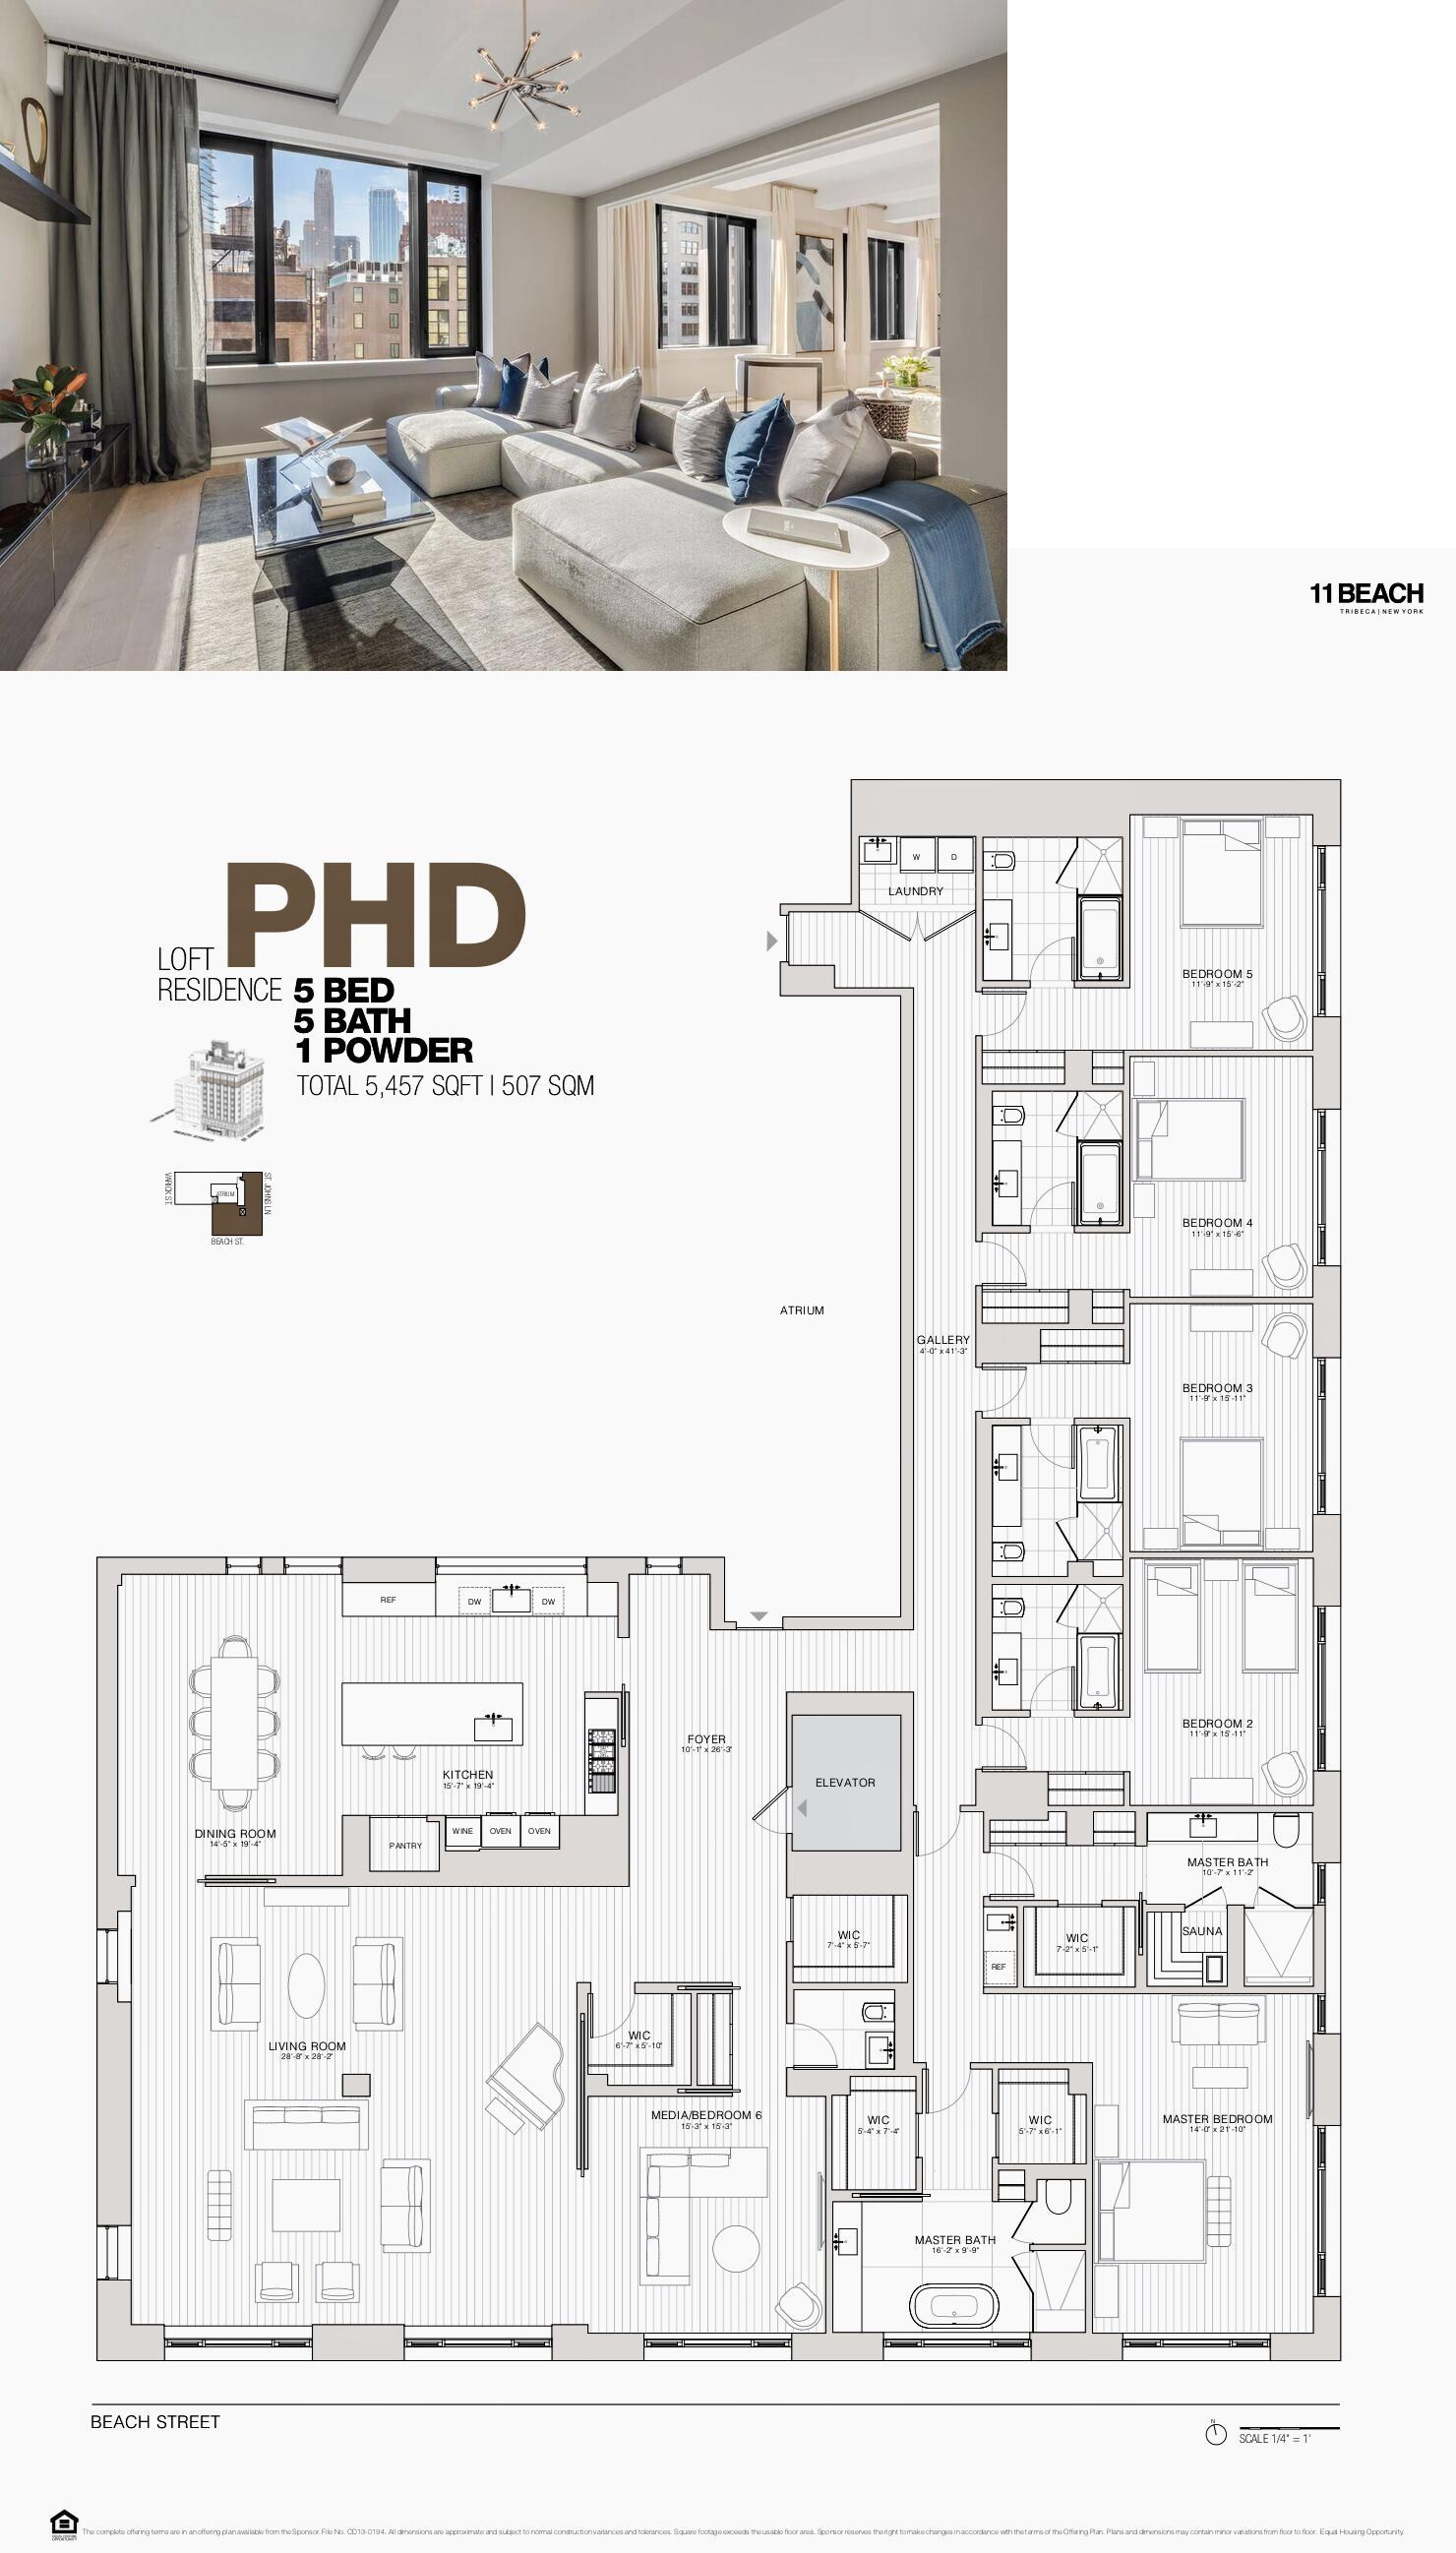 11 Beach Tribeca Penthouse D Condo Floor Plans Home Building Design Model House Plan